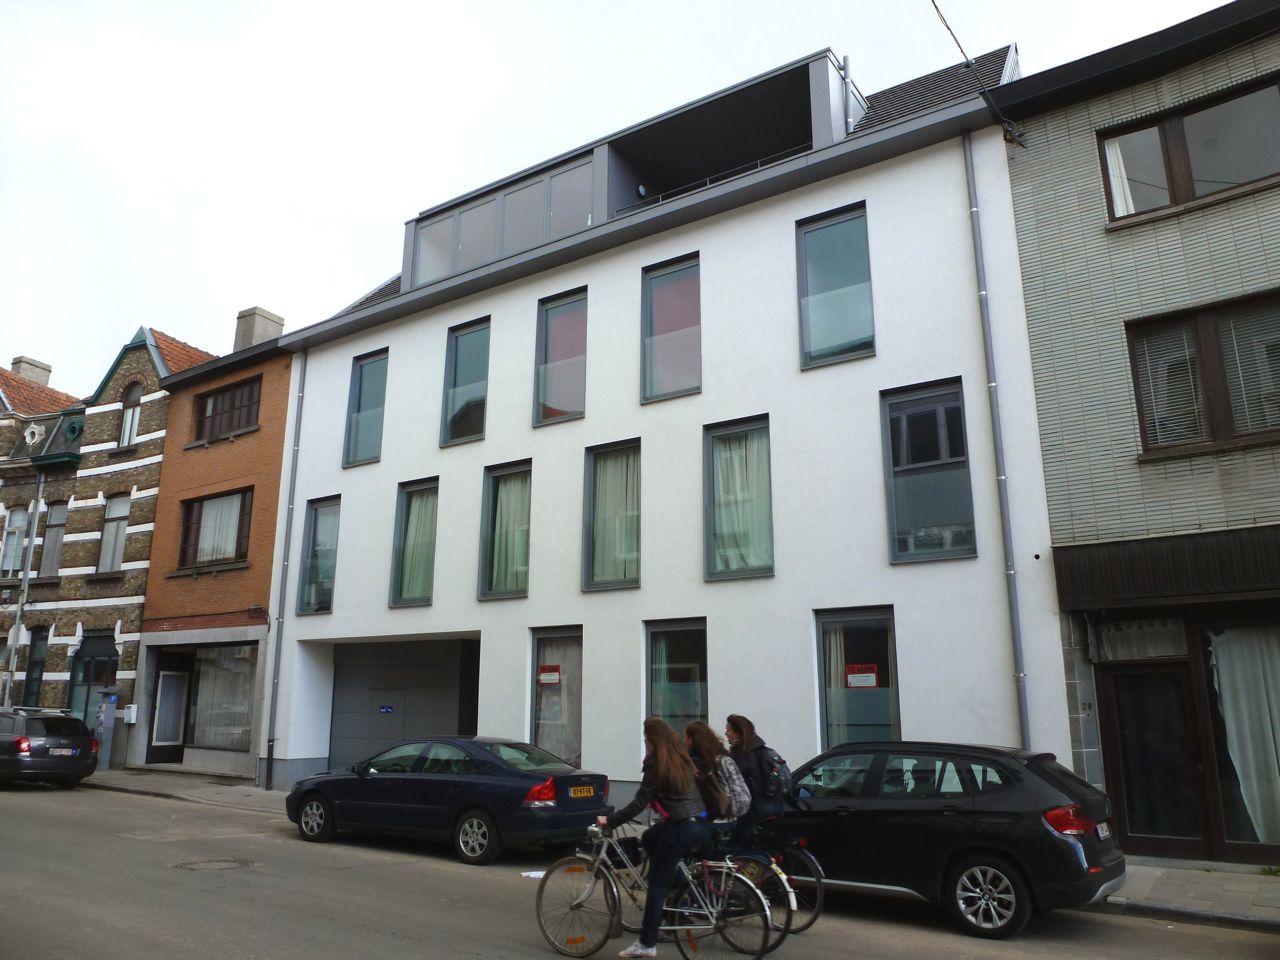 P1060057 | Baeyens & Beck architecten Gent | architect nieuwbouw renovatie interieur | high end | architectenbureau